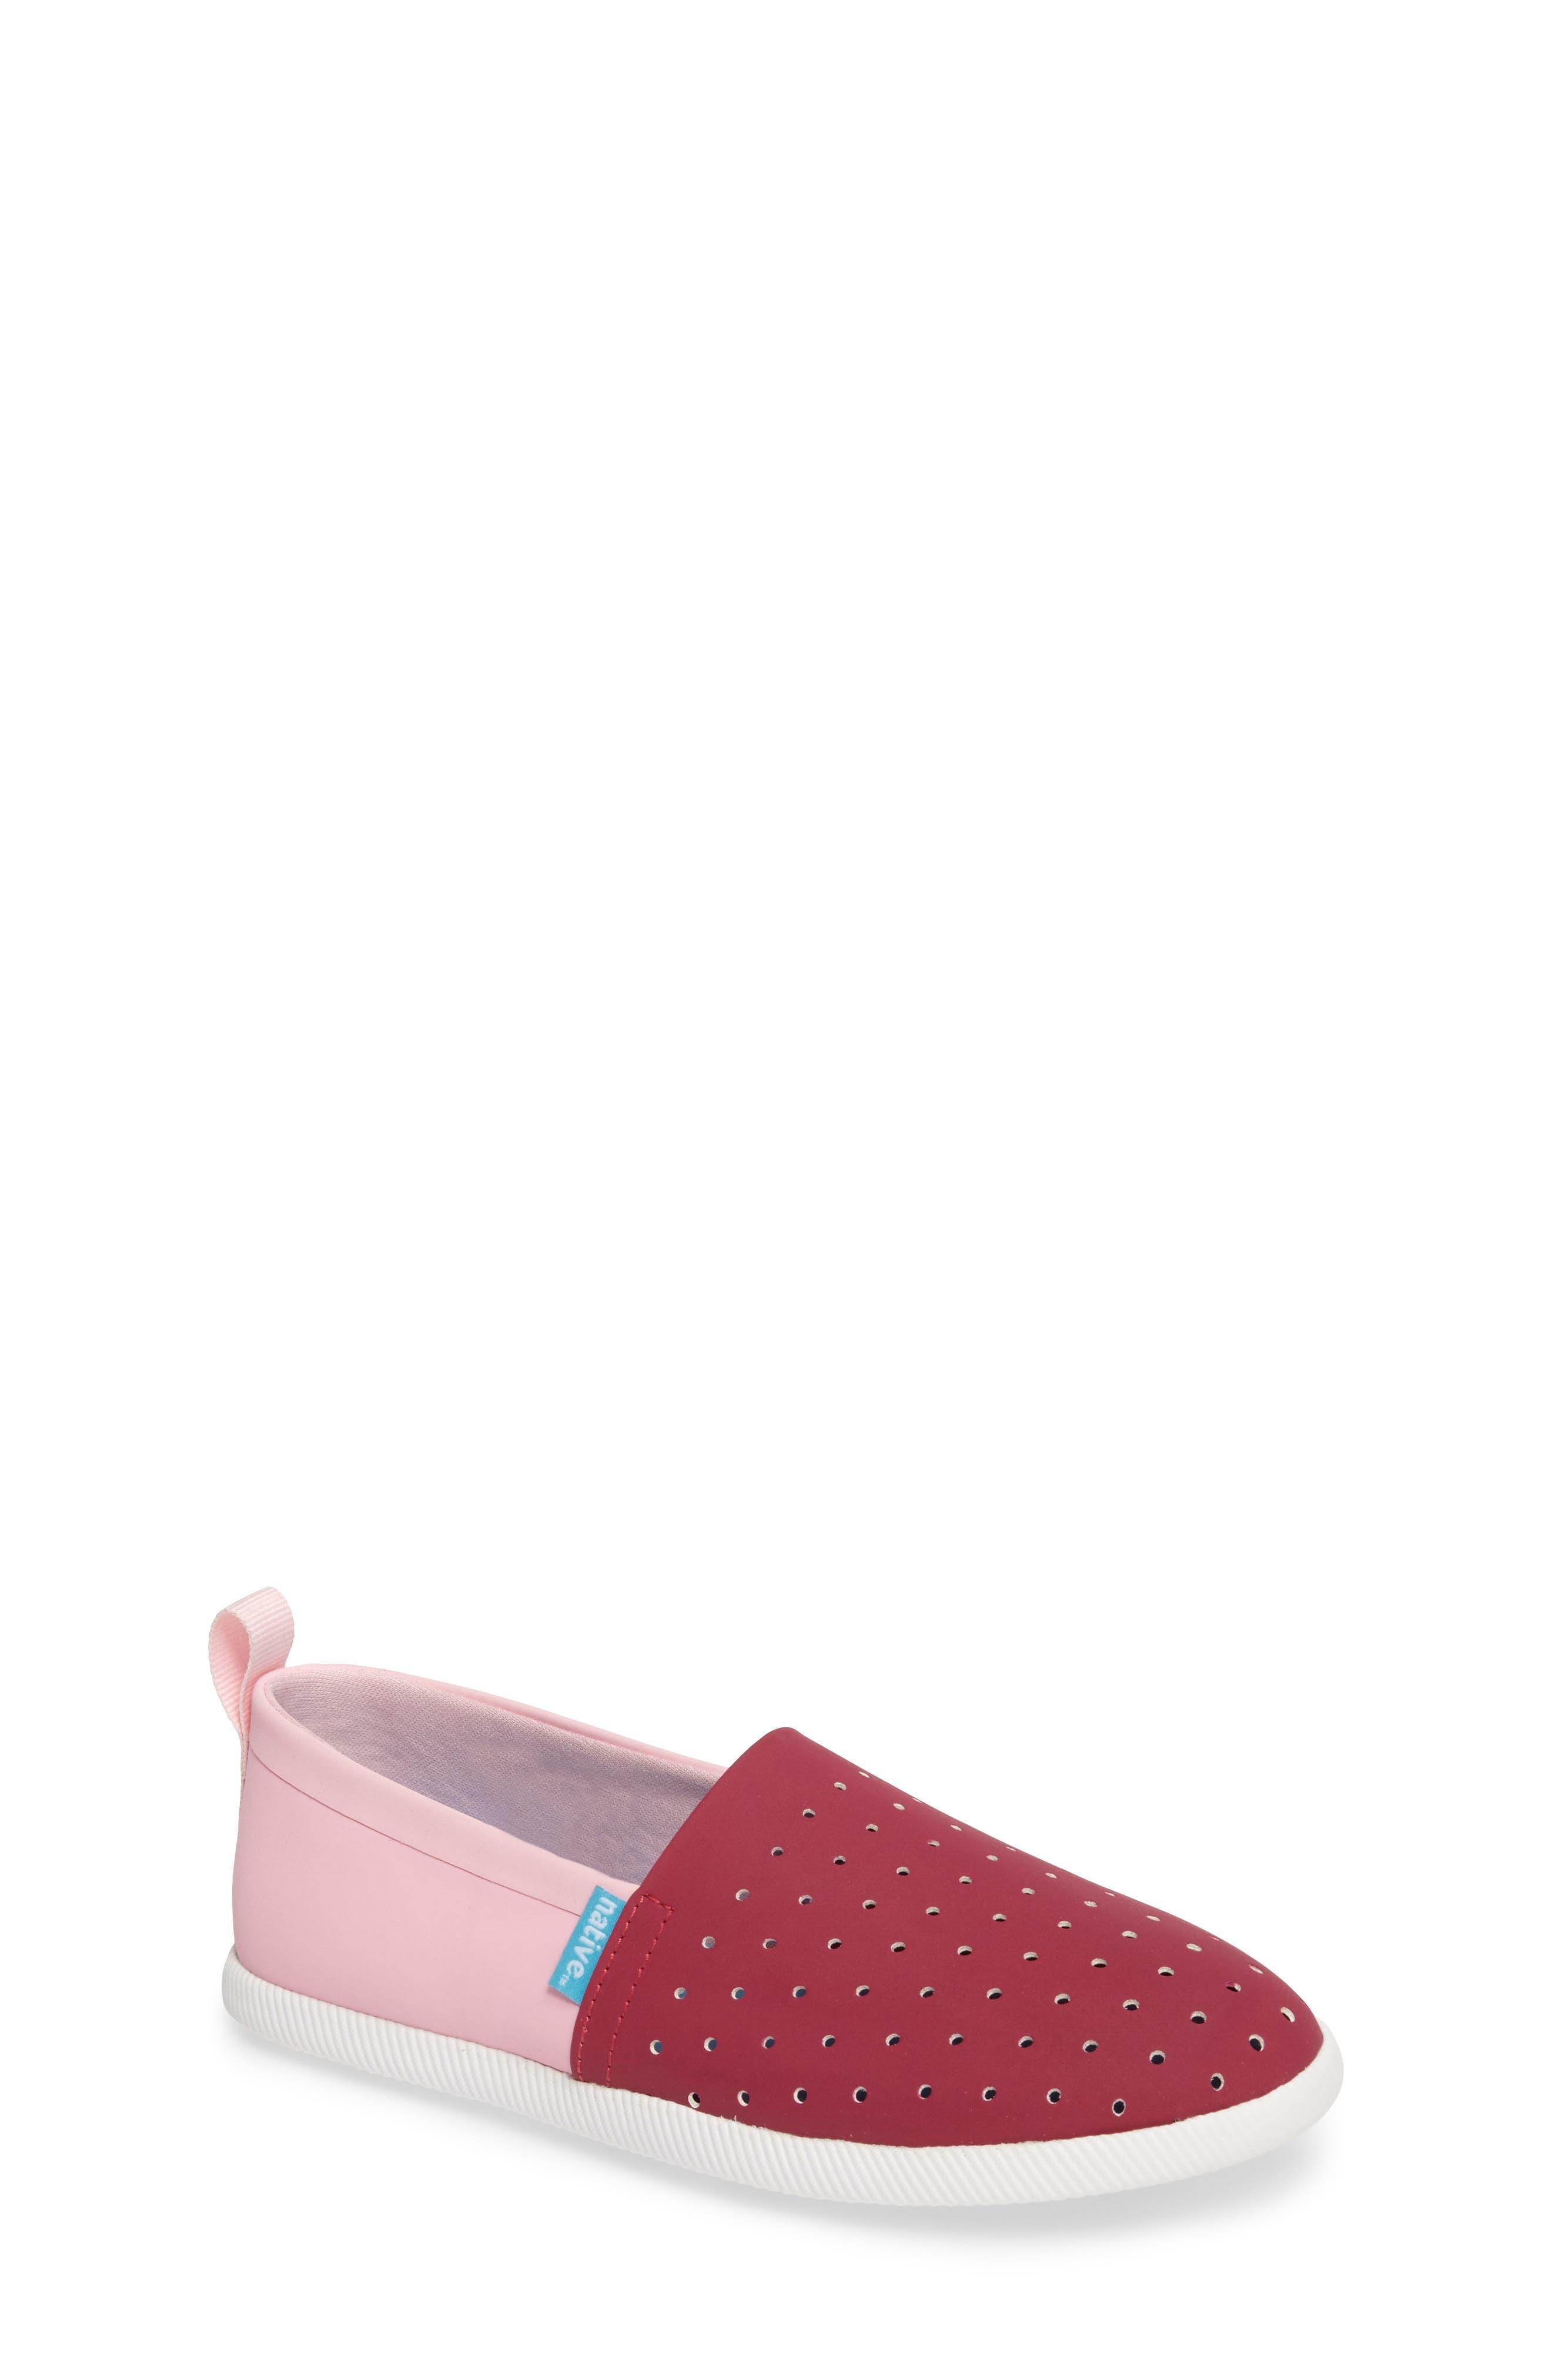 Main Image - Native Shoes 'Venice' Slip-On (Baby, Walker, Toddler & Little Kid)